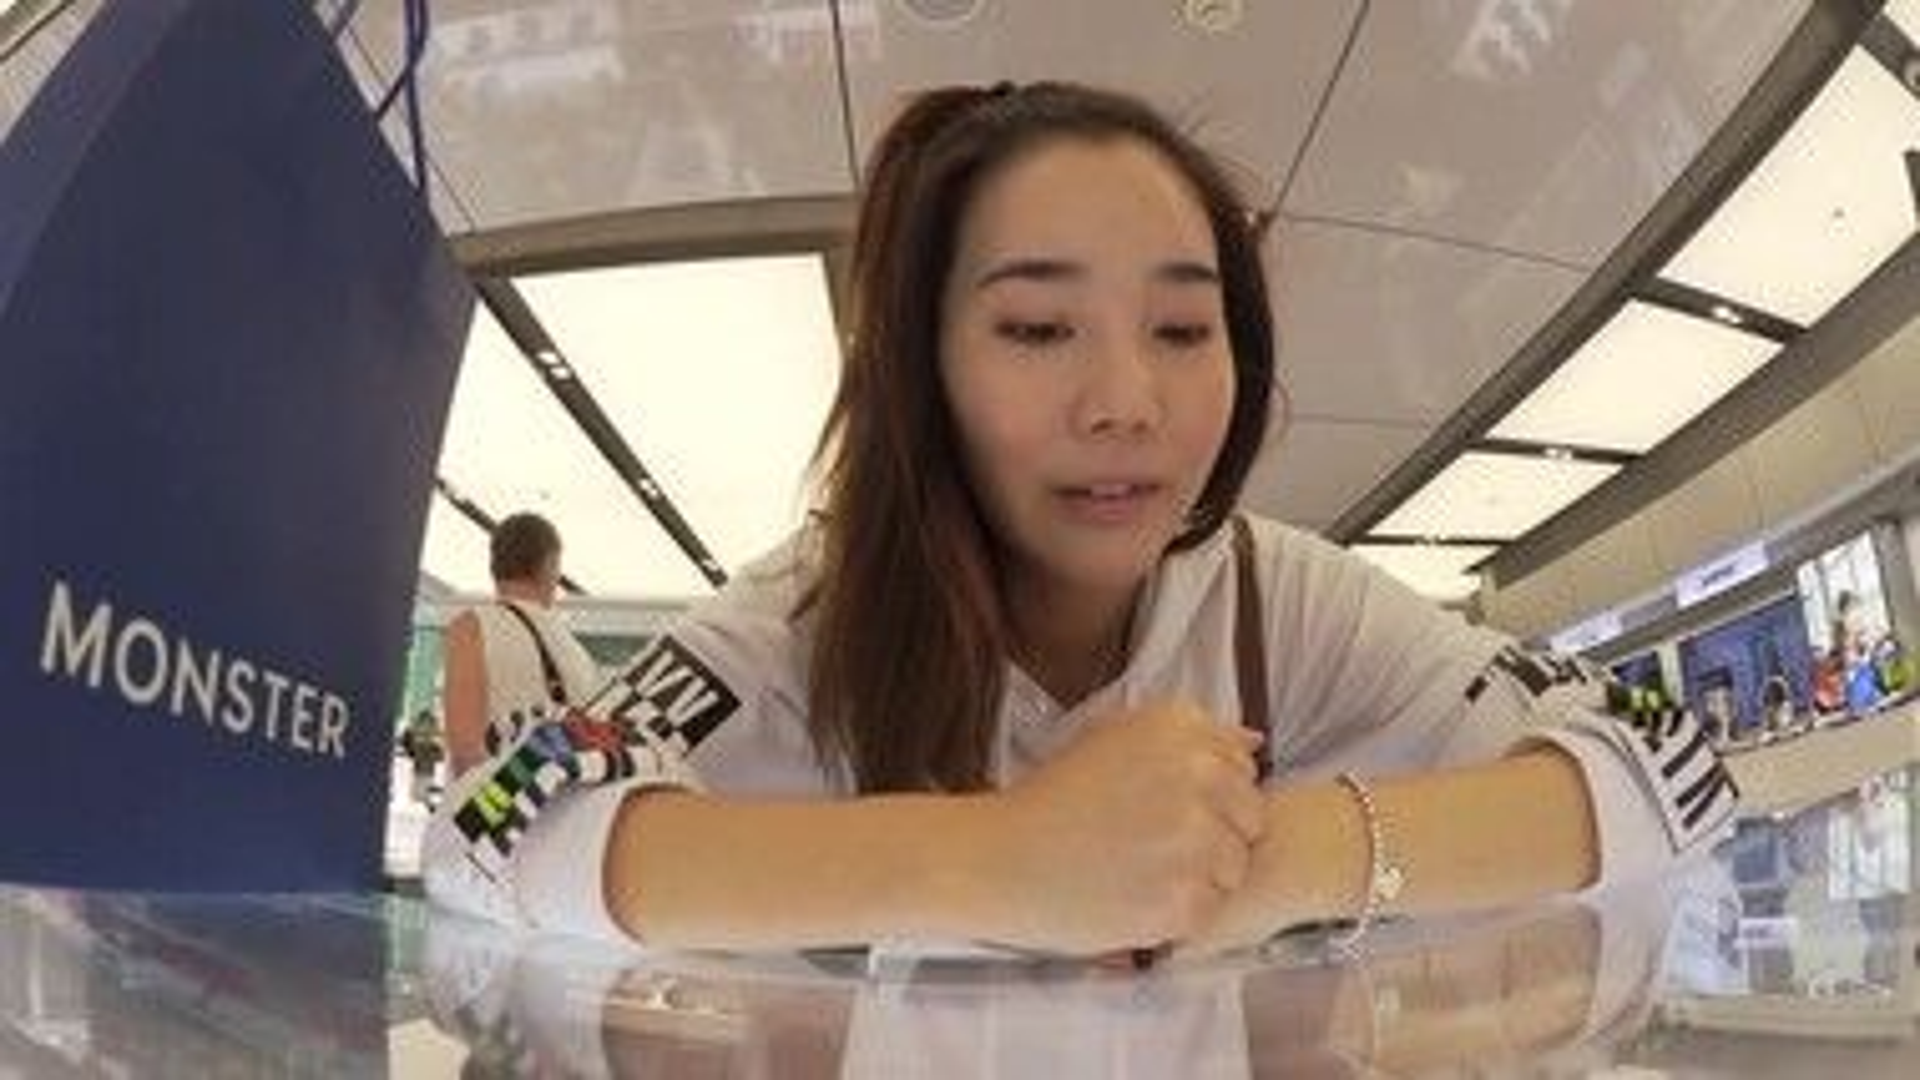 Joanday Episódio 29: Duty-Free Shopping at Incheon International Airport